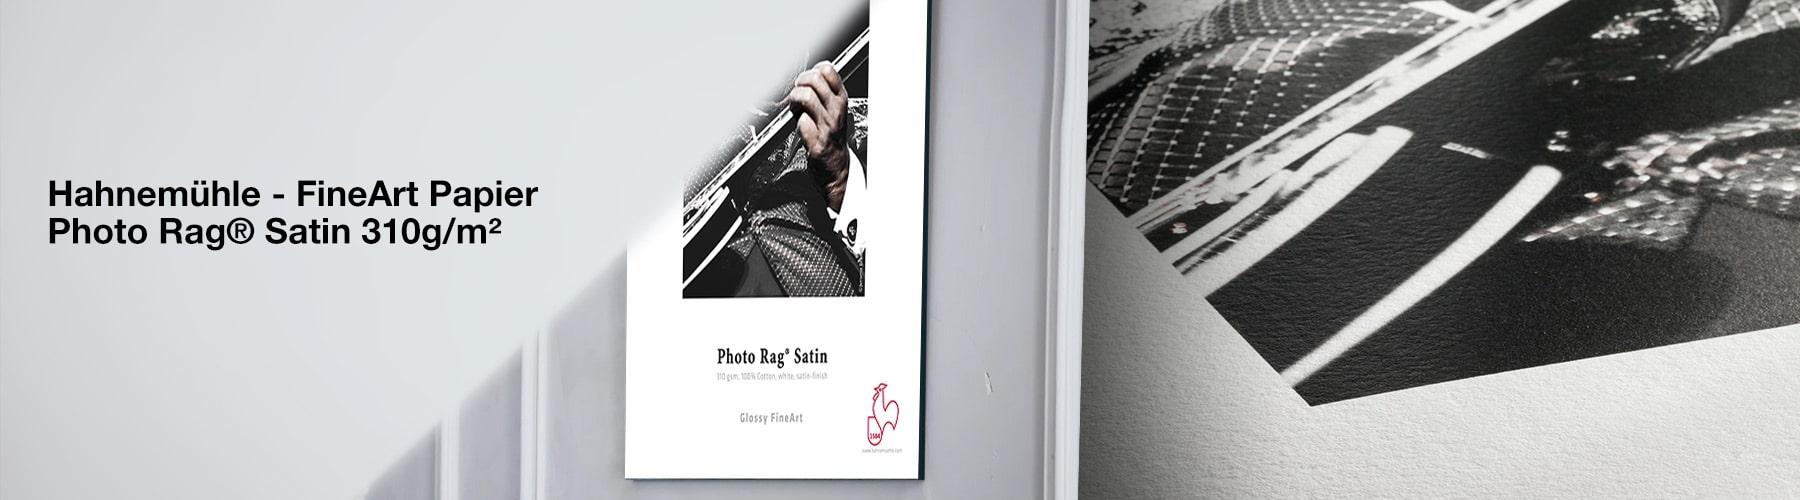 Hahnemühle Fine Art Papier - Photo Rag® Satin 310 g/m²